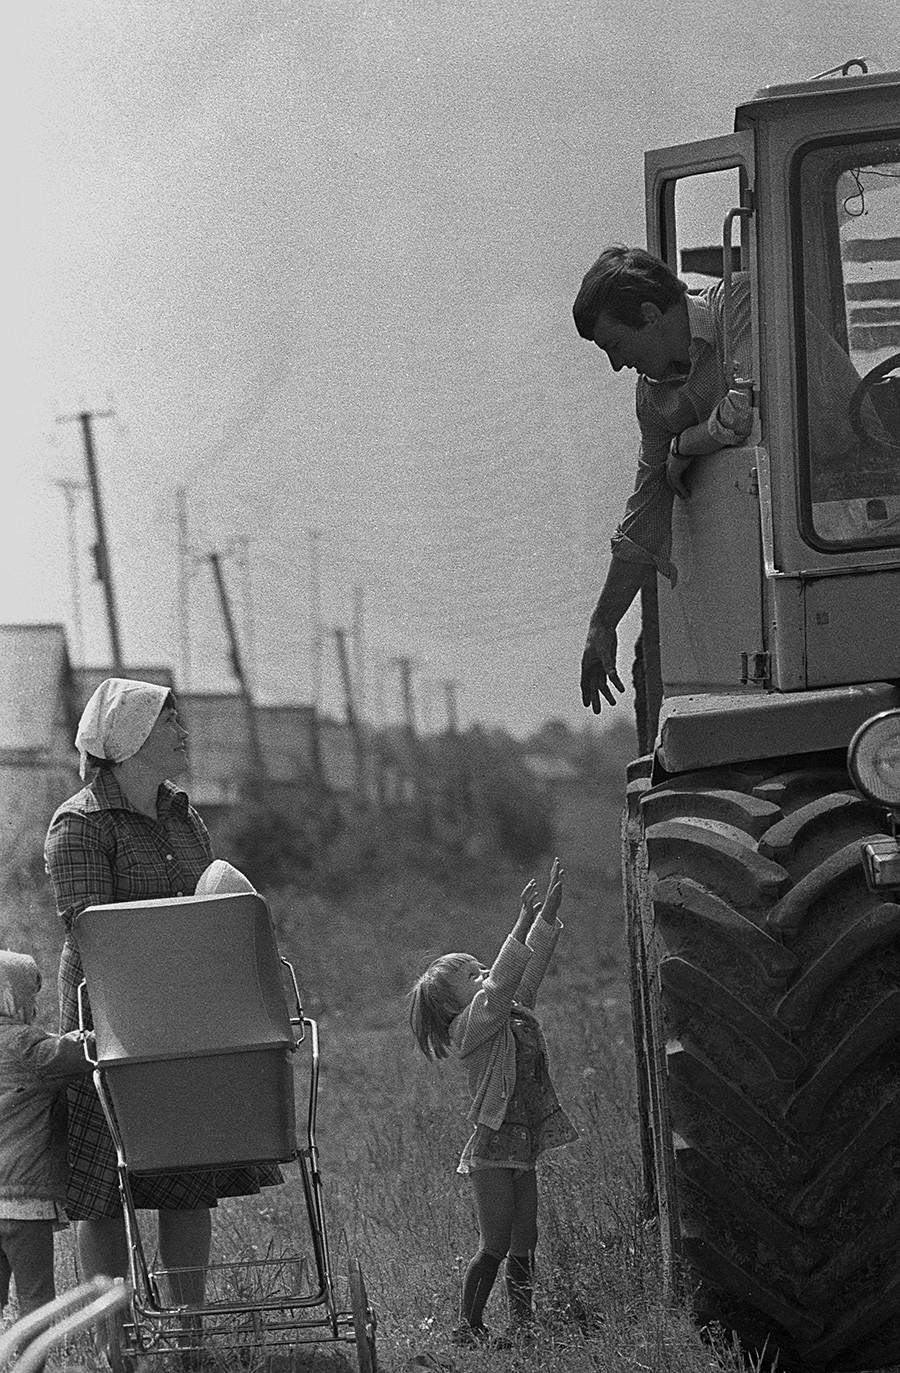 Upravljavec stroja kolhoza Sovjetska Belorusija se je vrnil domov s polja, 1987